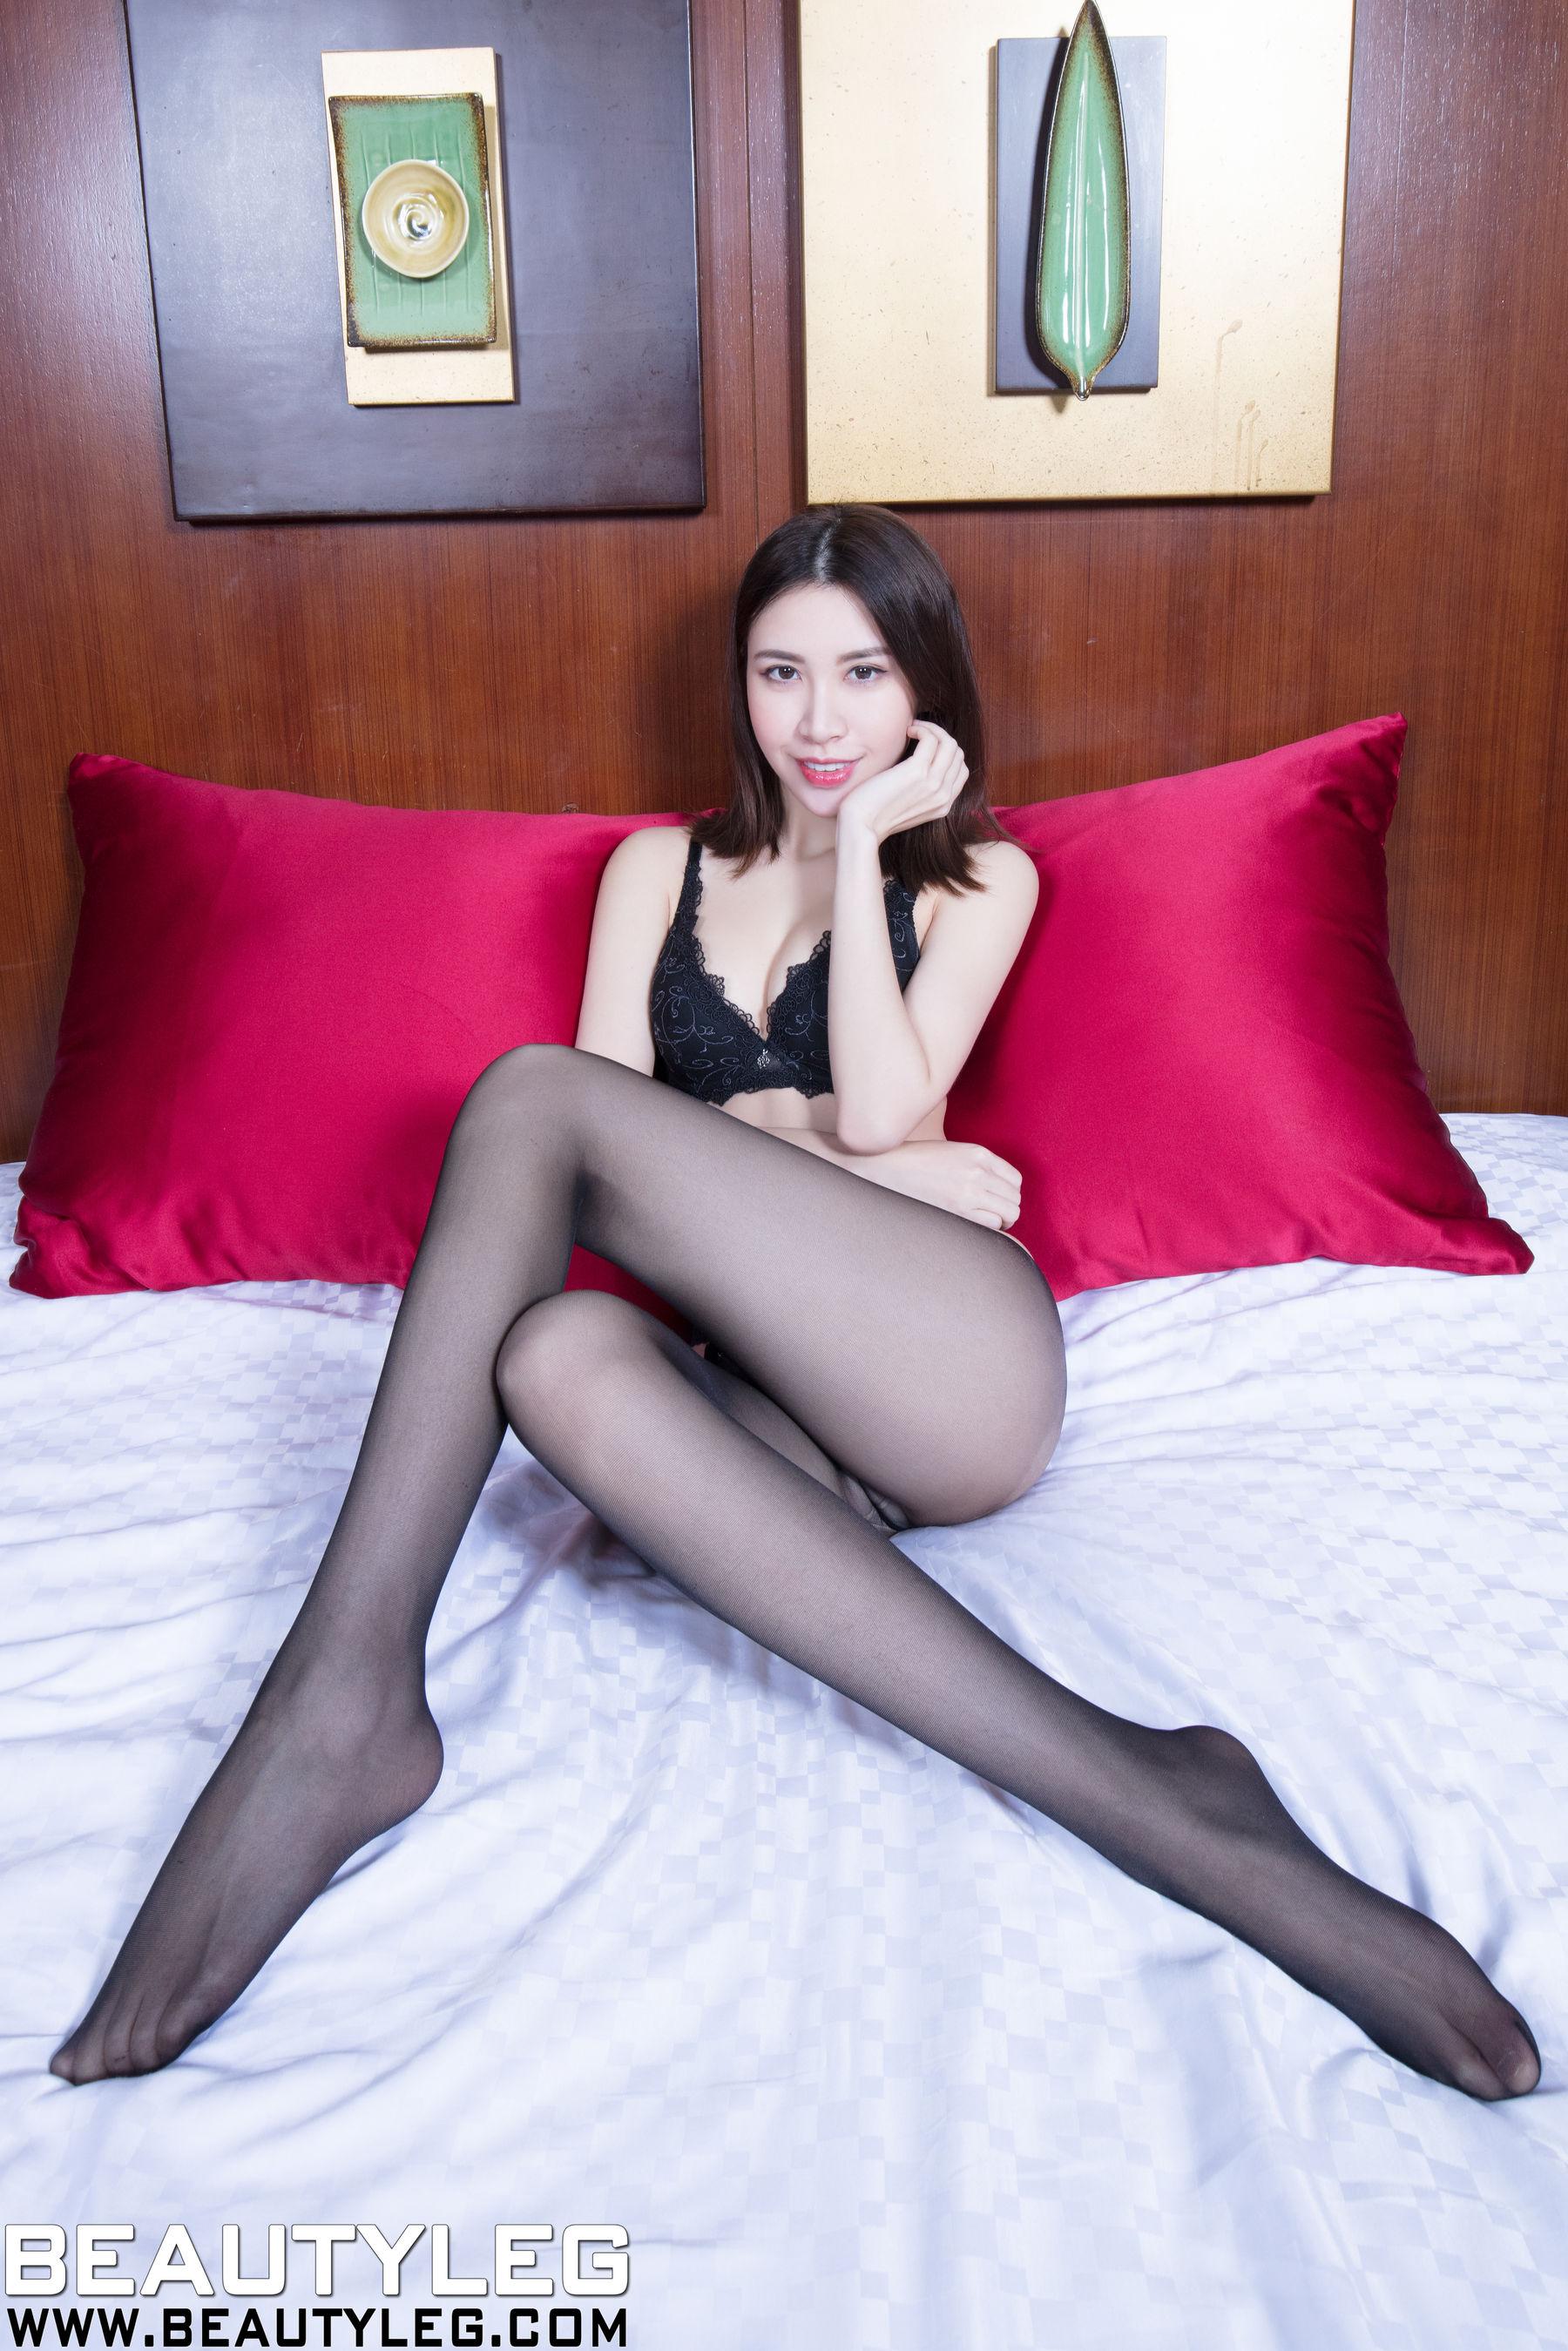 VOL.1244 [Beautyleg]丝袜美女丝袜美腿黑丝:崔多朵(崔德蓉,腿模Stephy)超高清个人性感漂亮大图(41P)